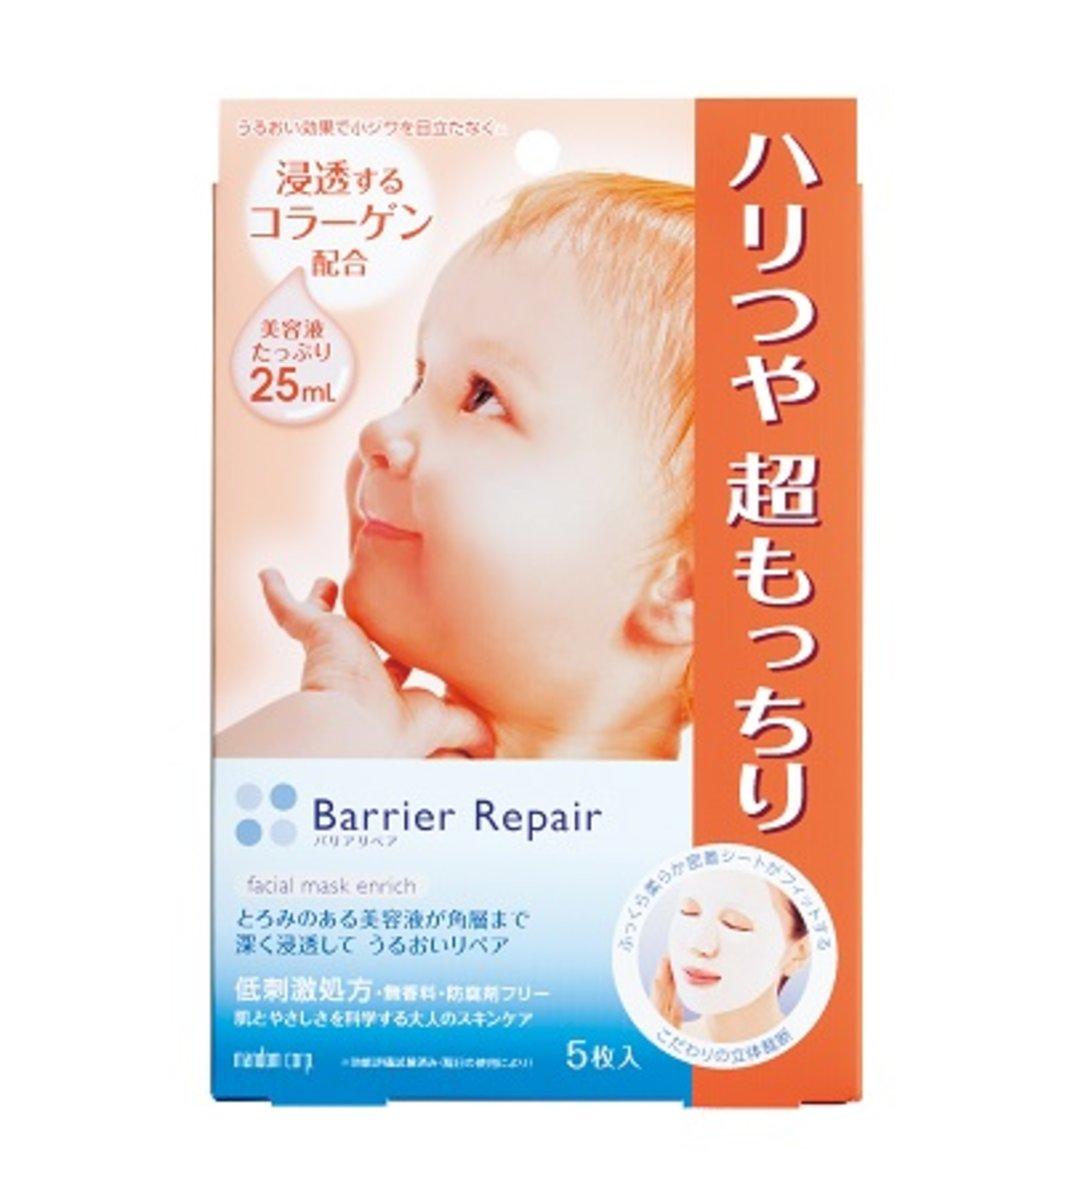 Facial Mask Enrich - Barrier Repair (25ml x 5 pcs)